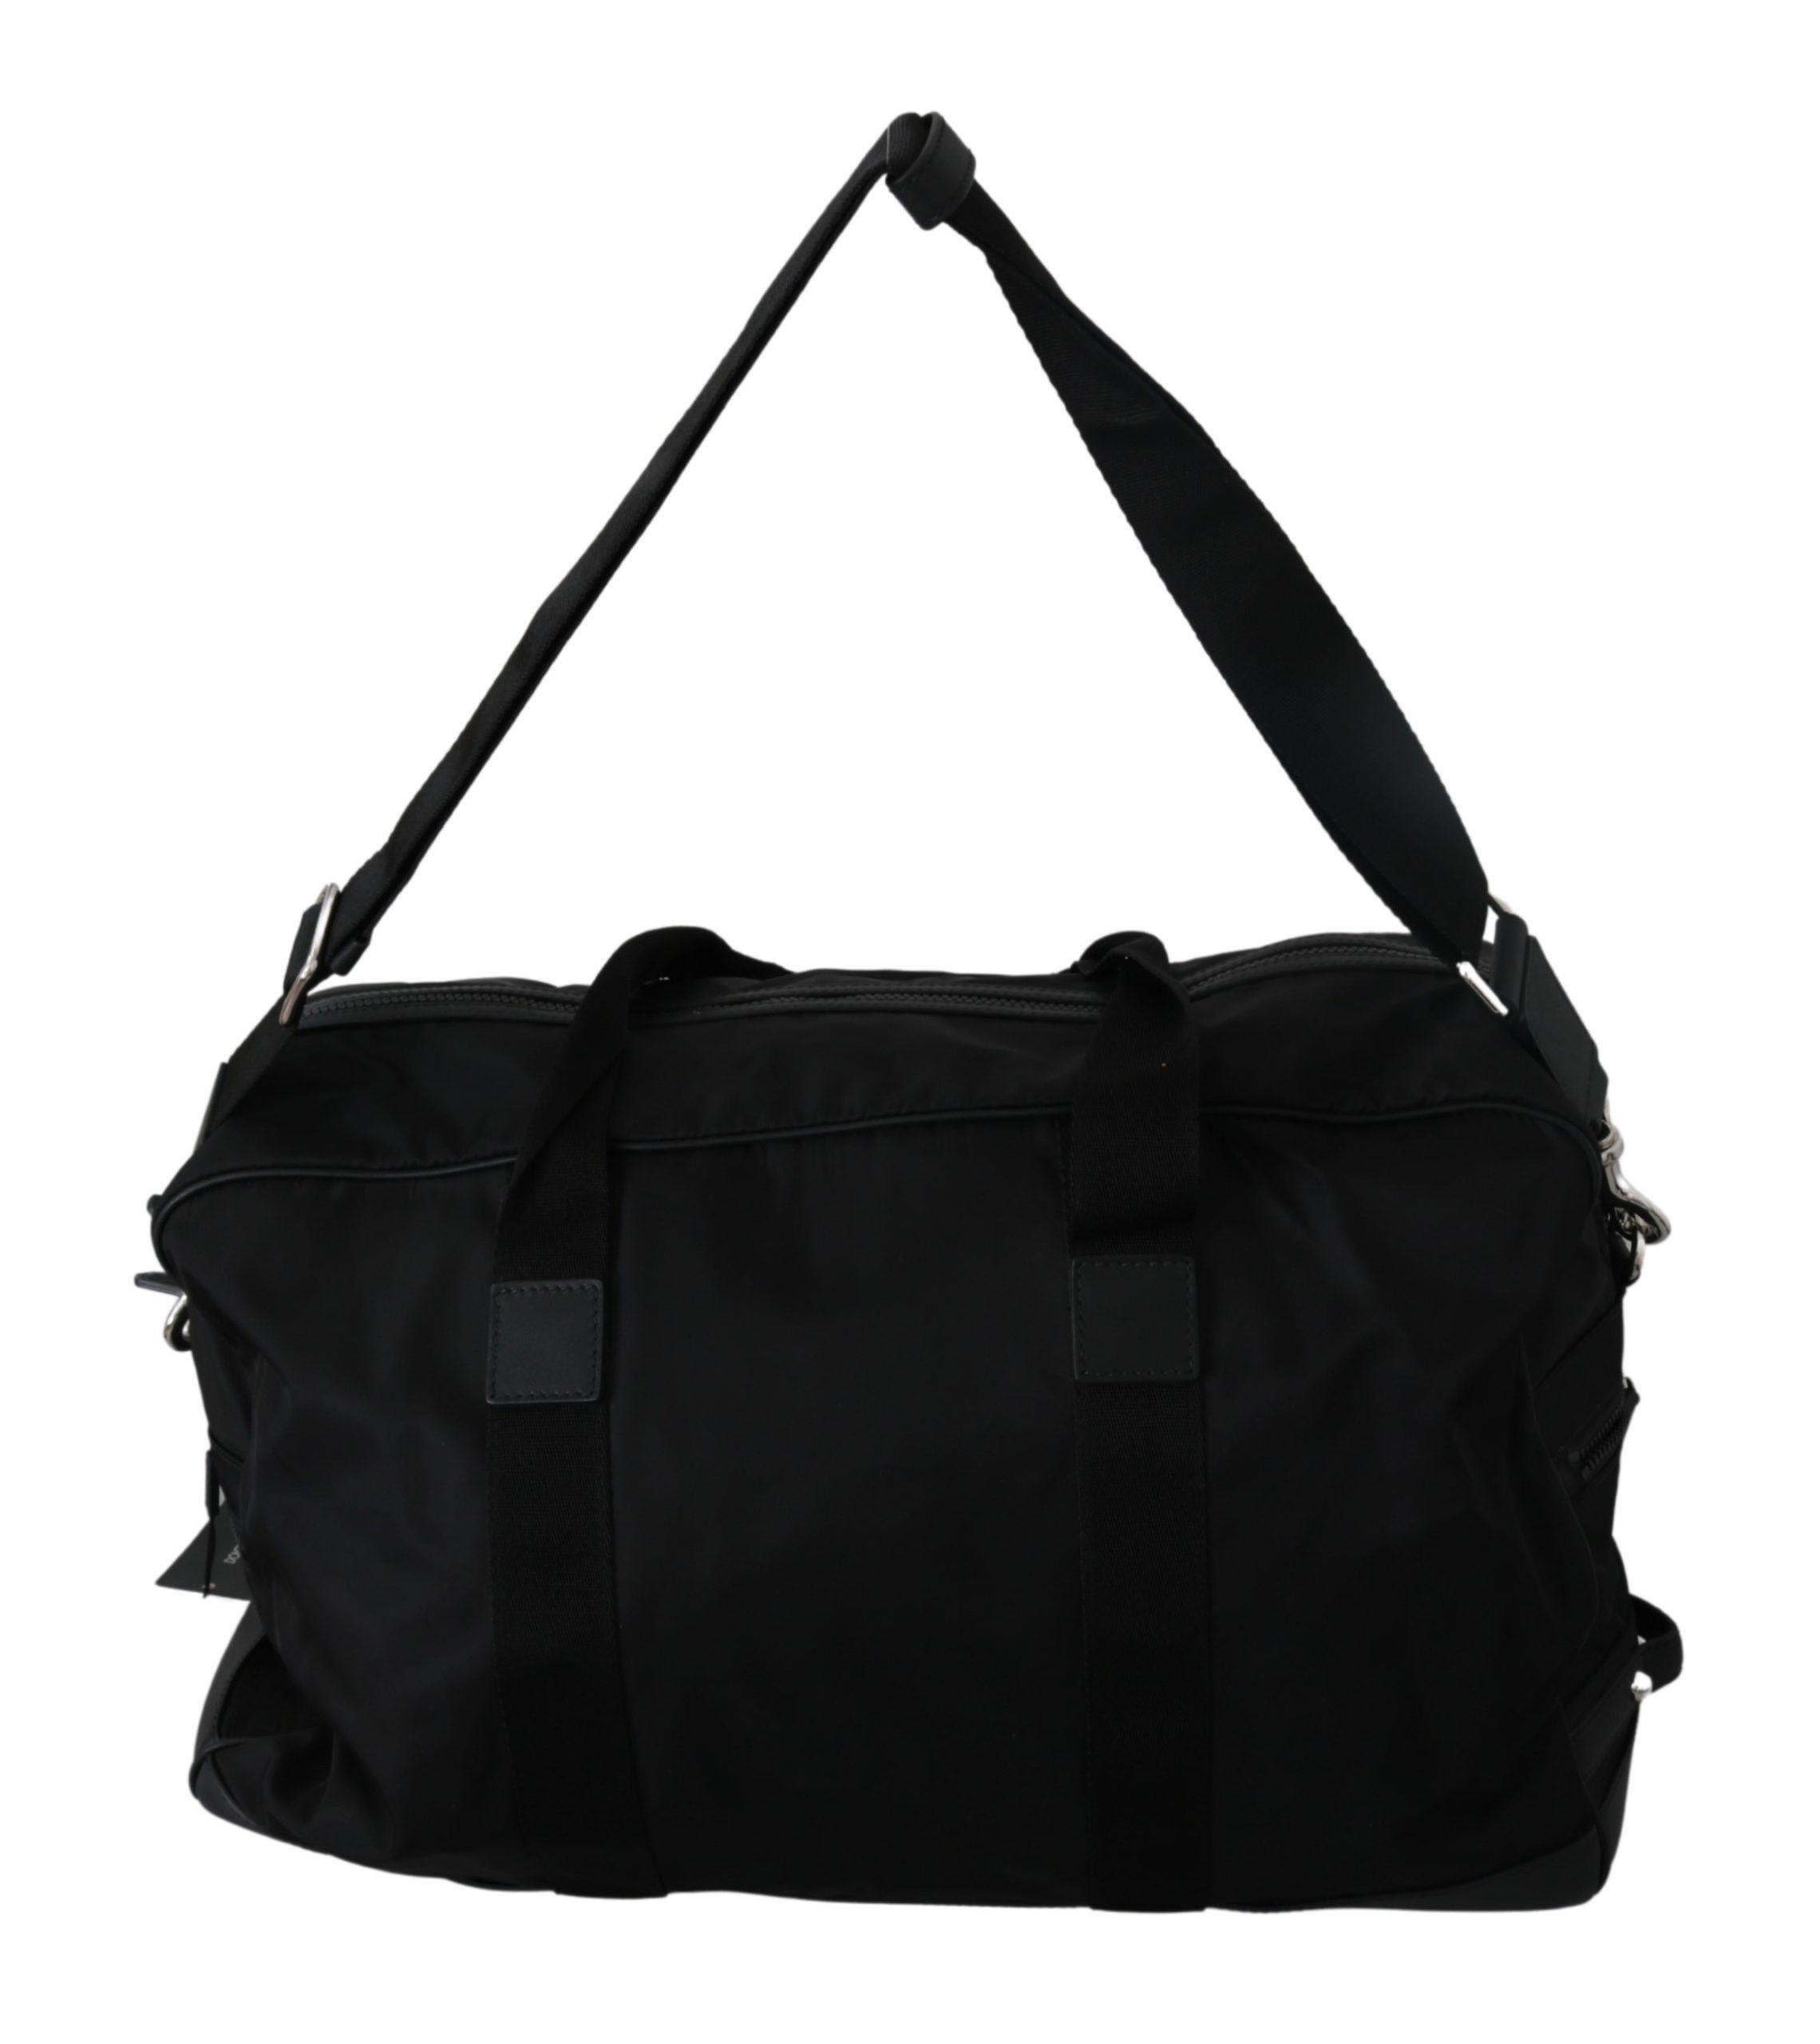 Dolce & Gabbana Men's Shoulder Sling Travel Luggage Nylon Bag Black VAS9235